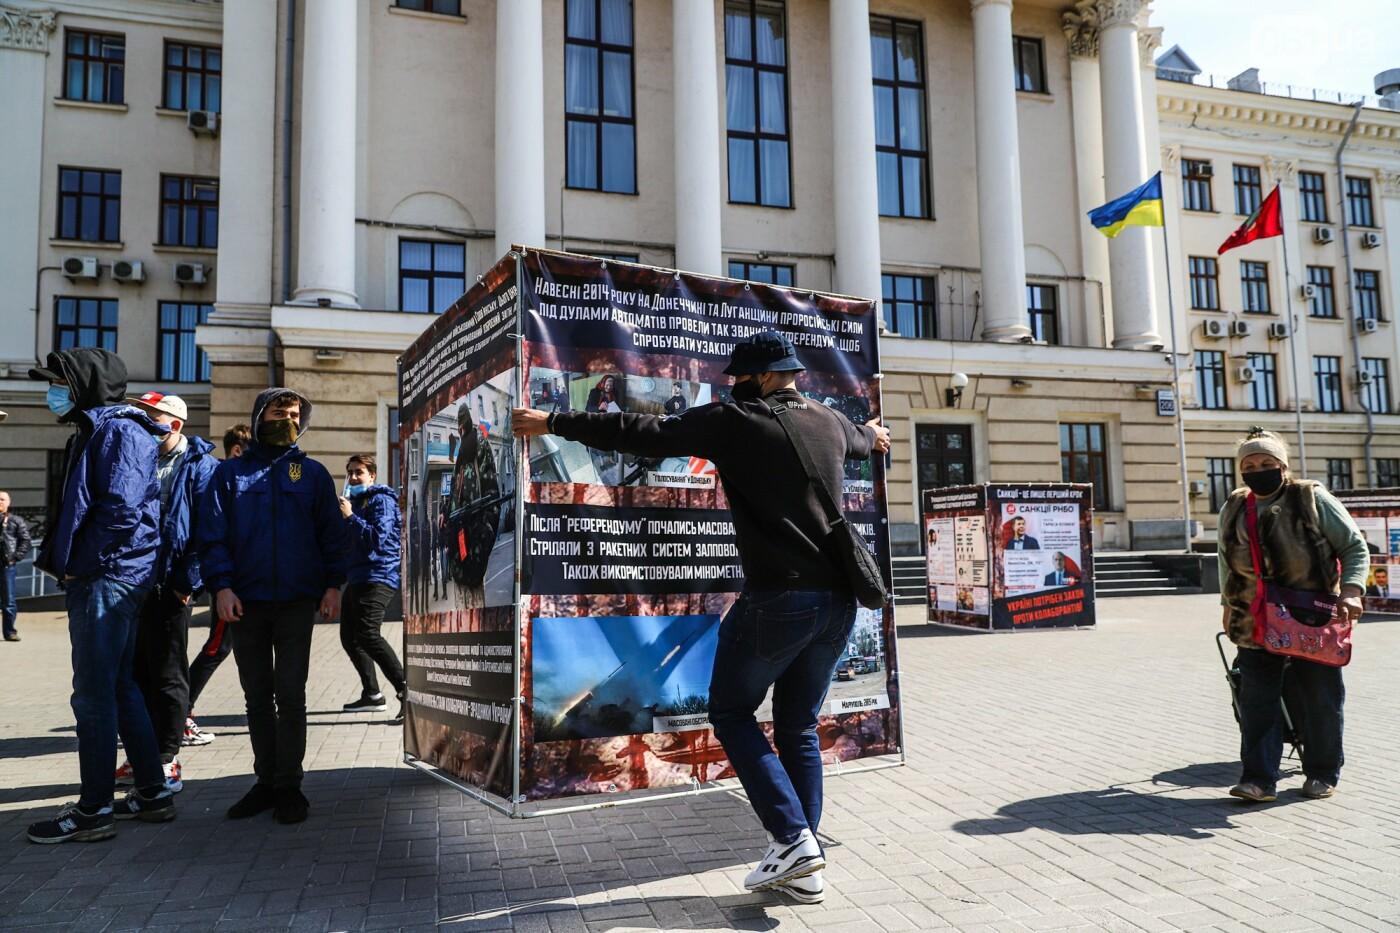 В Запорожье возле мэрии установили стенды с портретами Медведчука и Шария, - ФОТО, фото-1